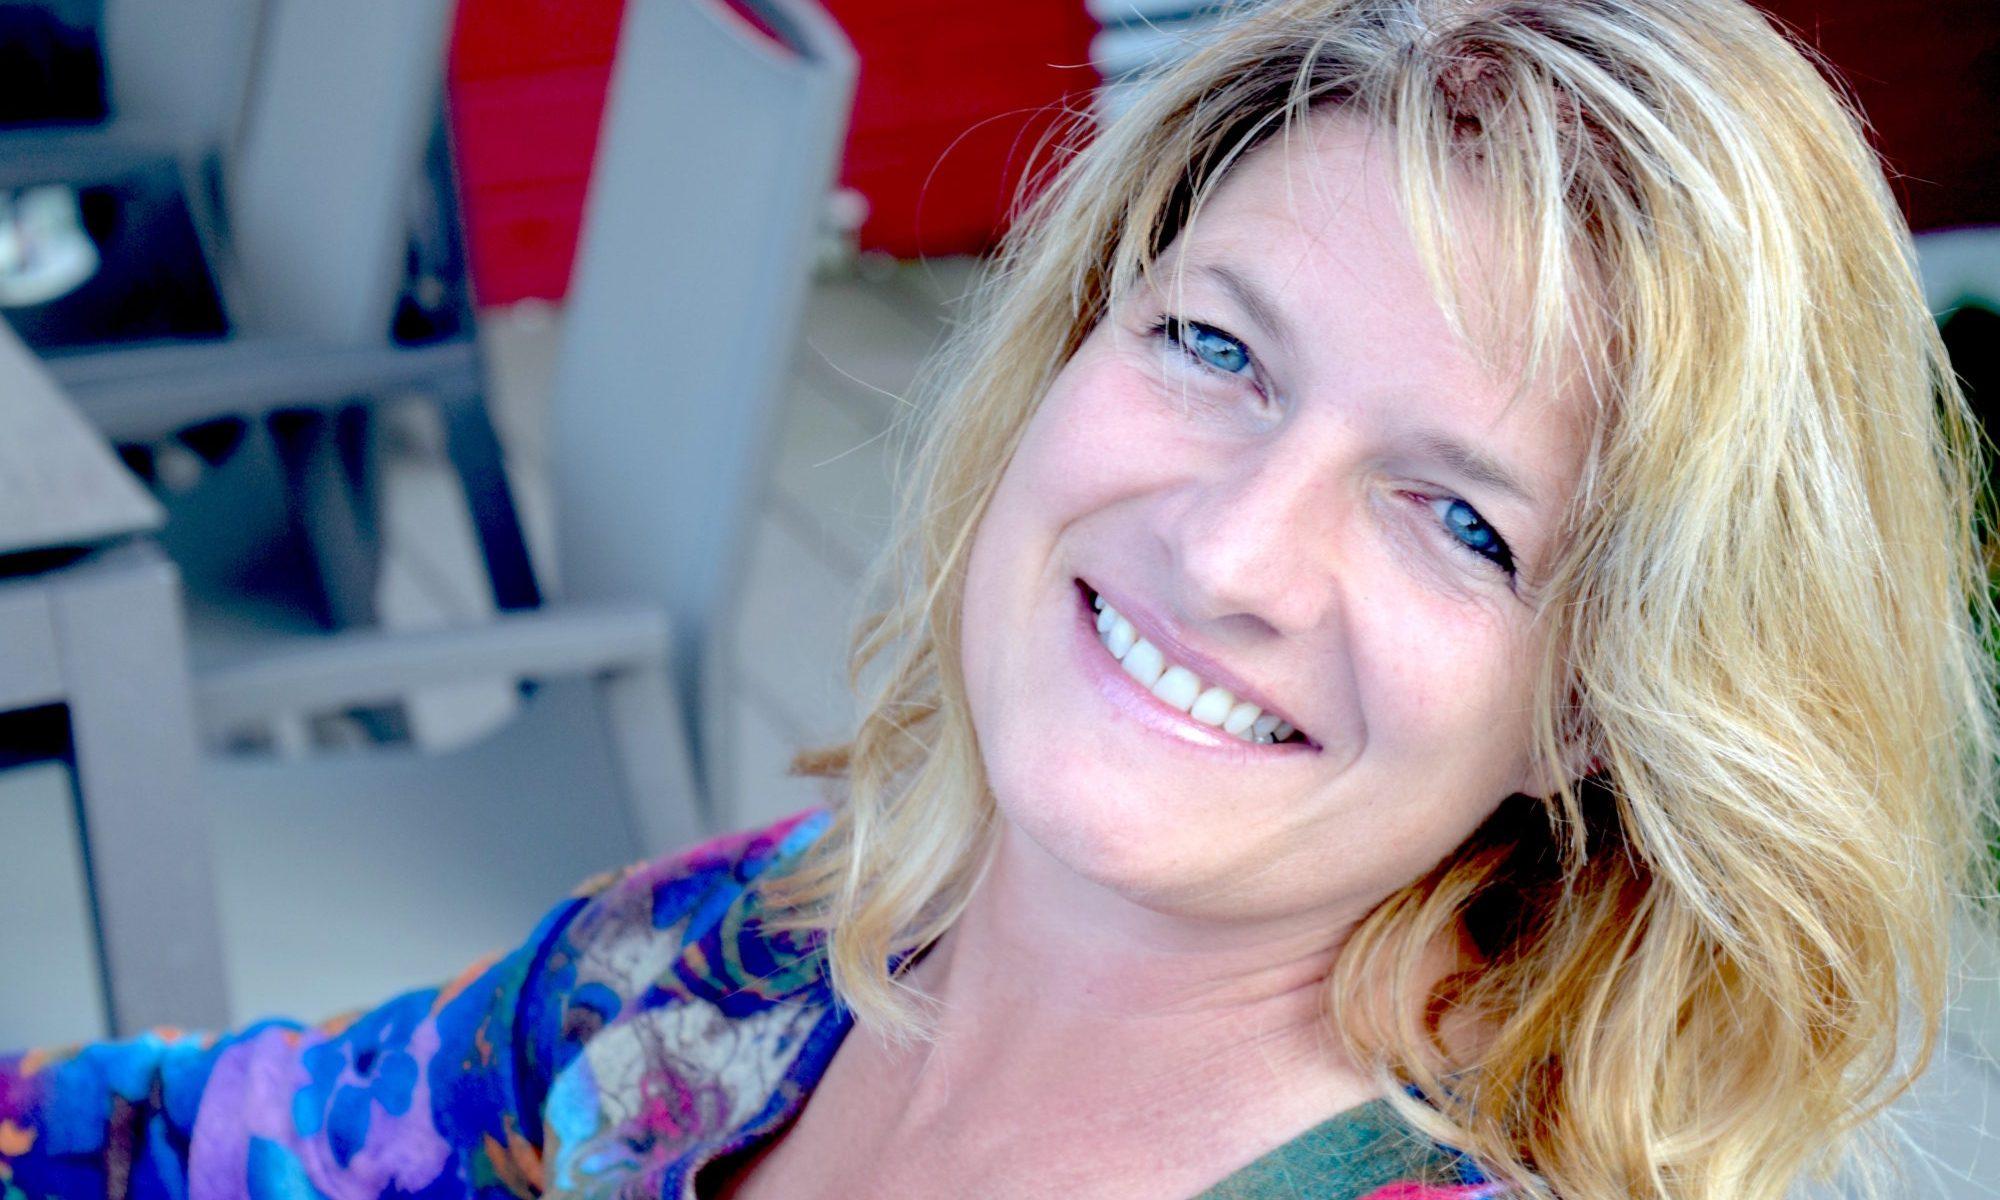 Barbara En 1 mot changement developpement personnel